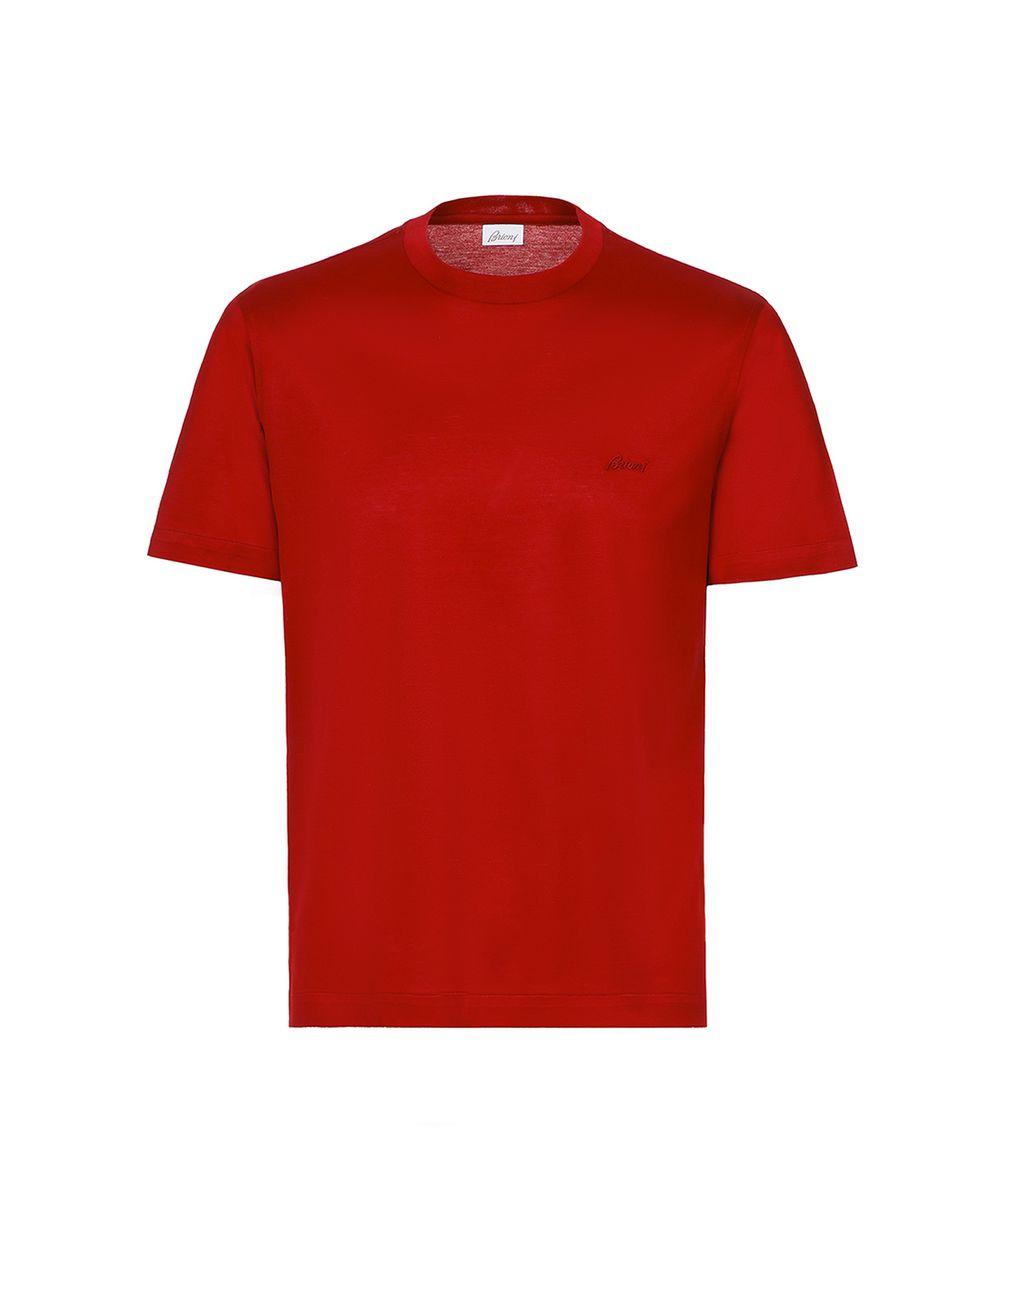 BRIONI Red Logoed T-Shirt T-Shirts & Polos Man f